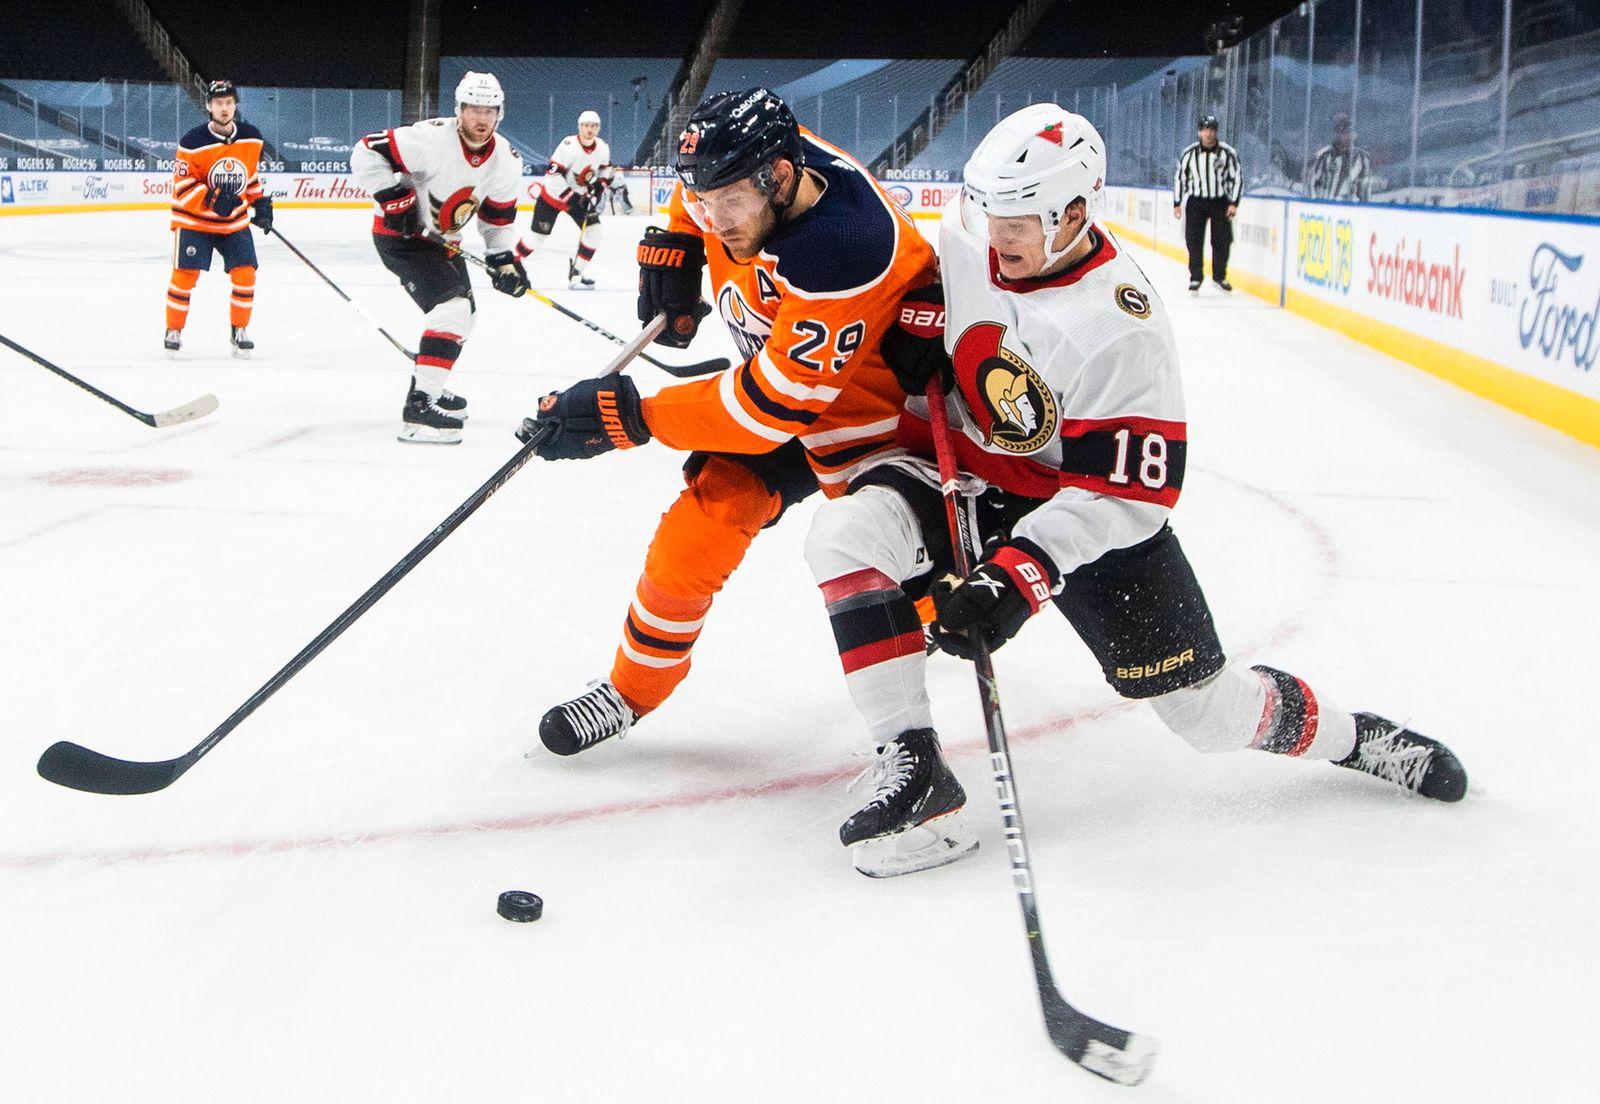 January 31, 2021, Edmonton, ab, Canada: Edmonton Oilers Leon Draisaitl (29) and Ottawa Senators Tim Stuetzle (18) battl